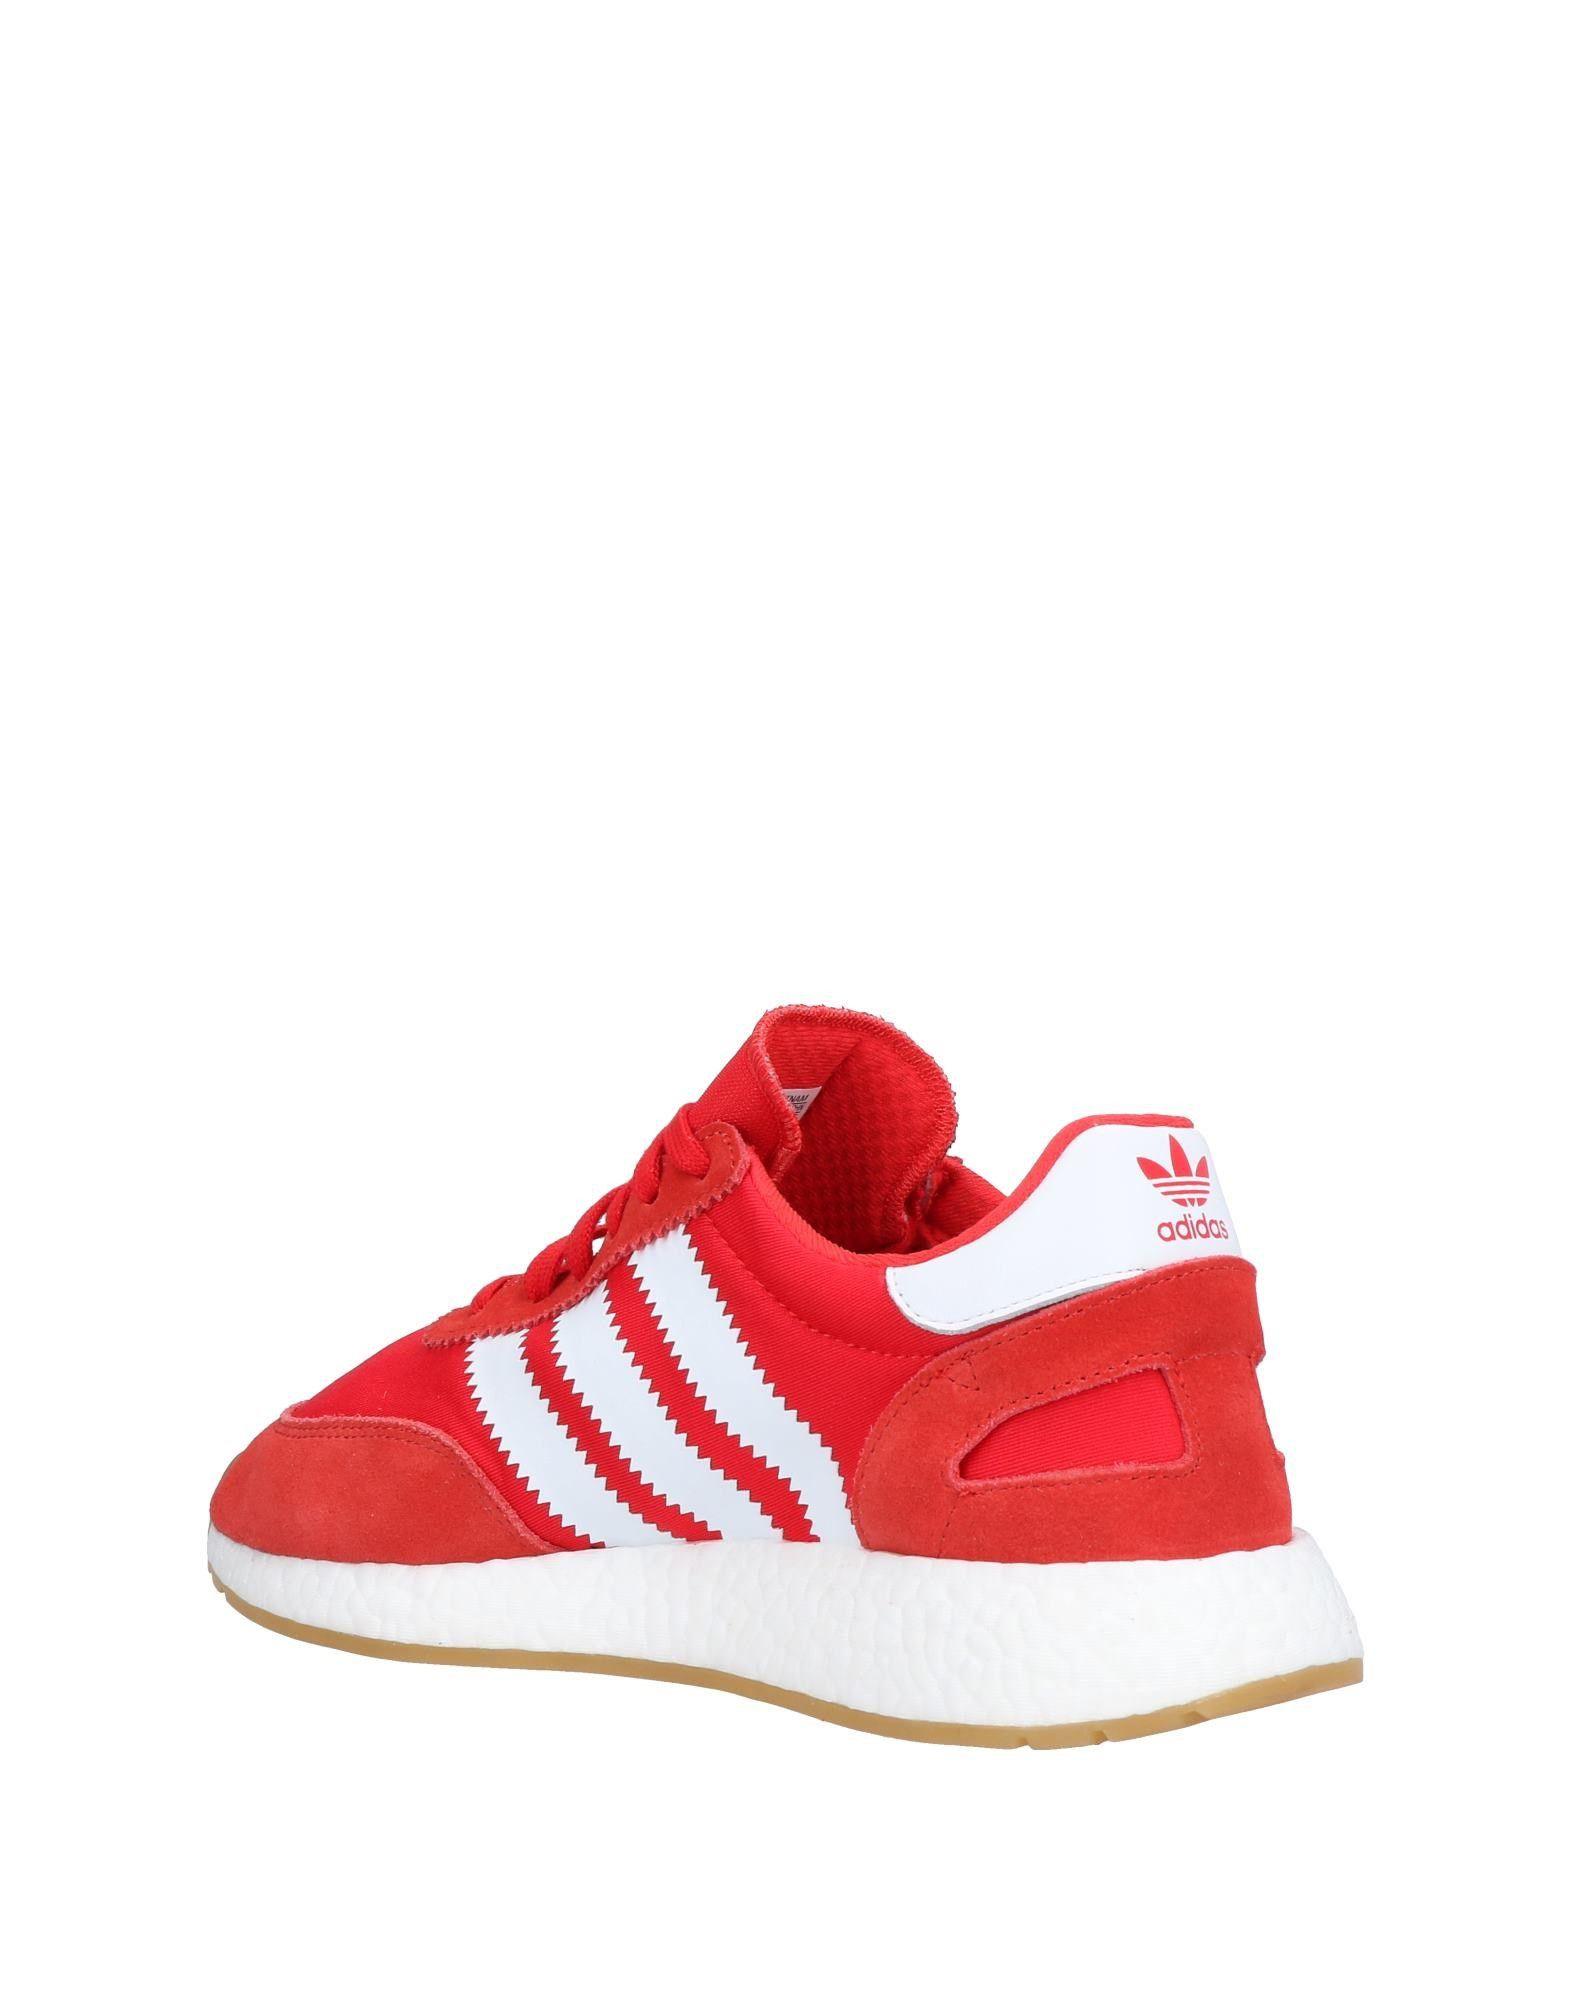 Sneakers Sneakers Sneakers Adidas Originals Uomo - 11461892AX dda851